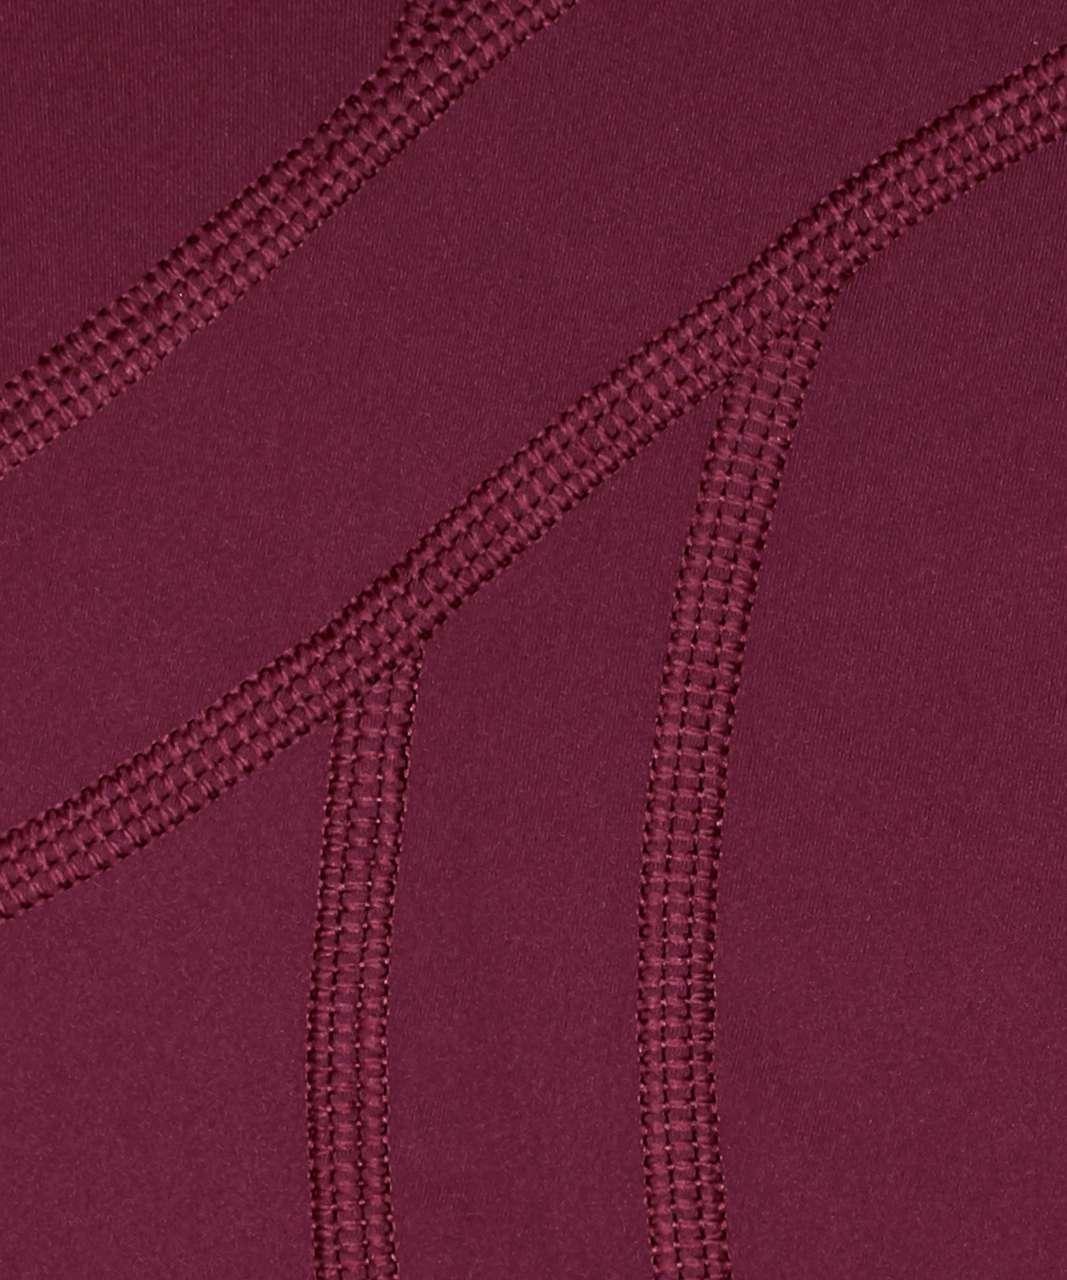 Lululemon Define Jacket *Nulux - Deep Ruby